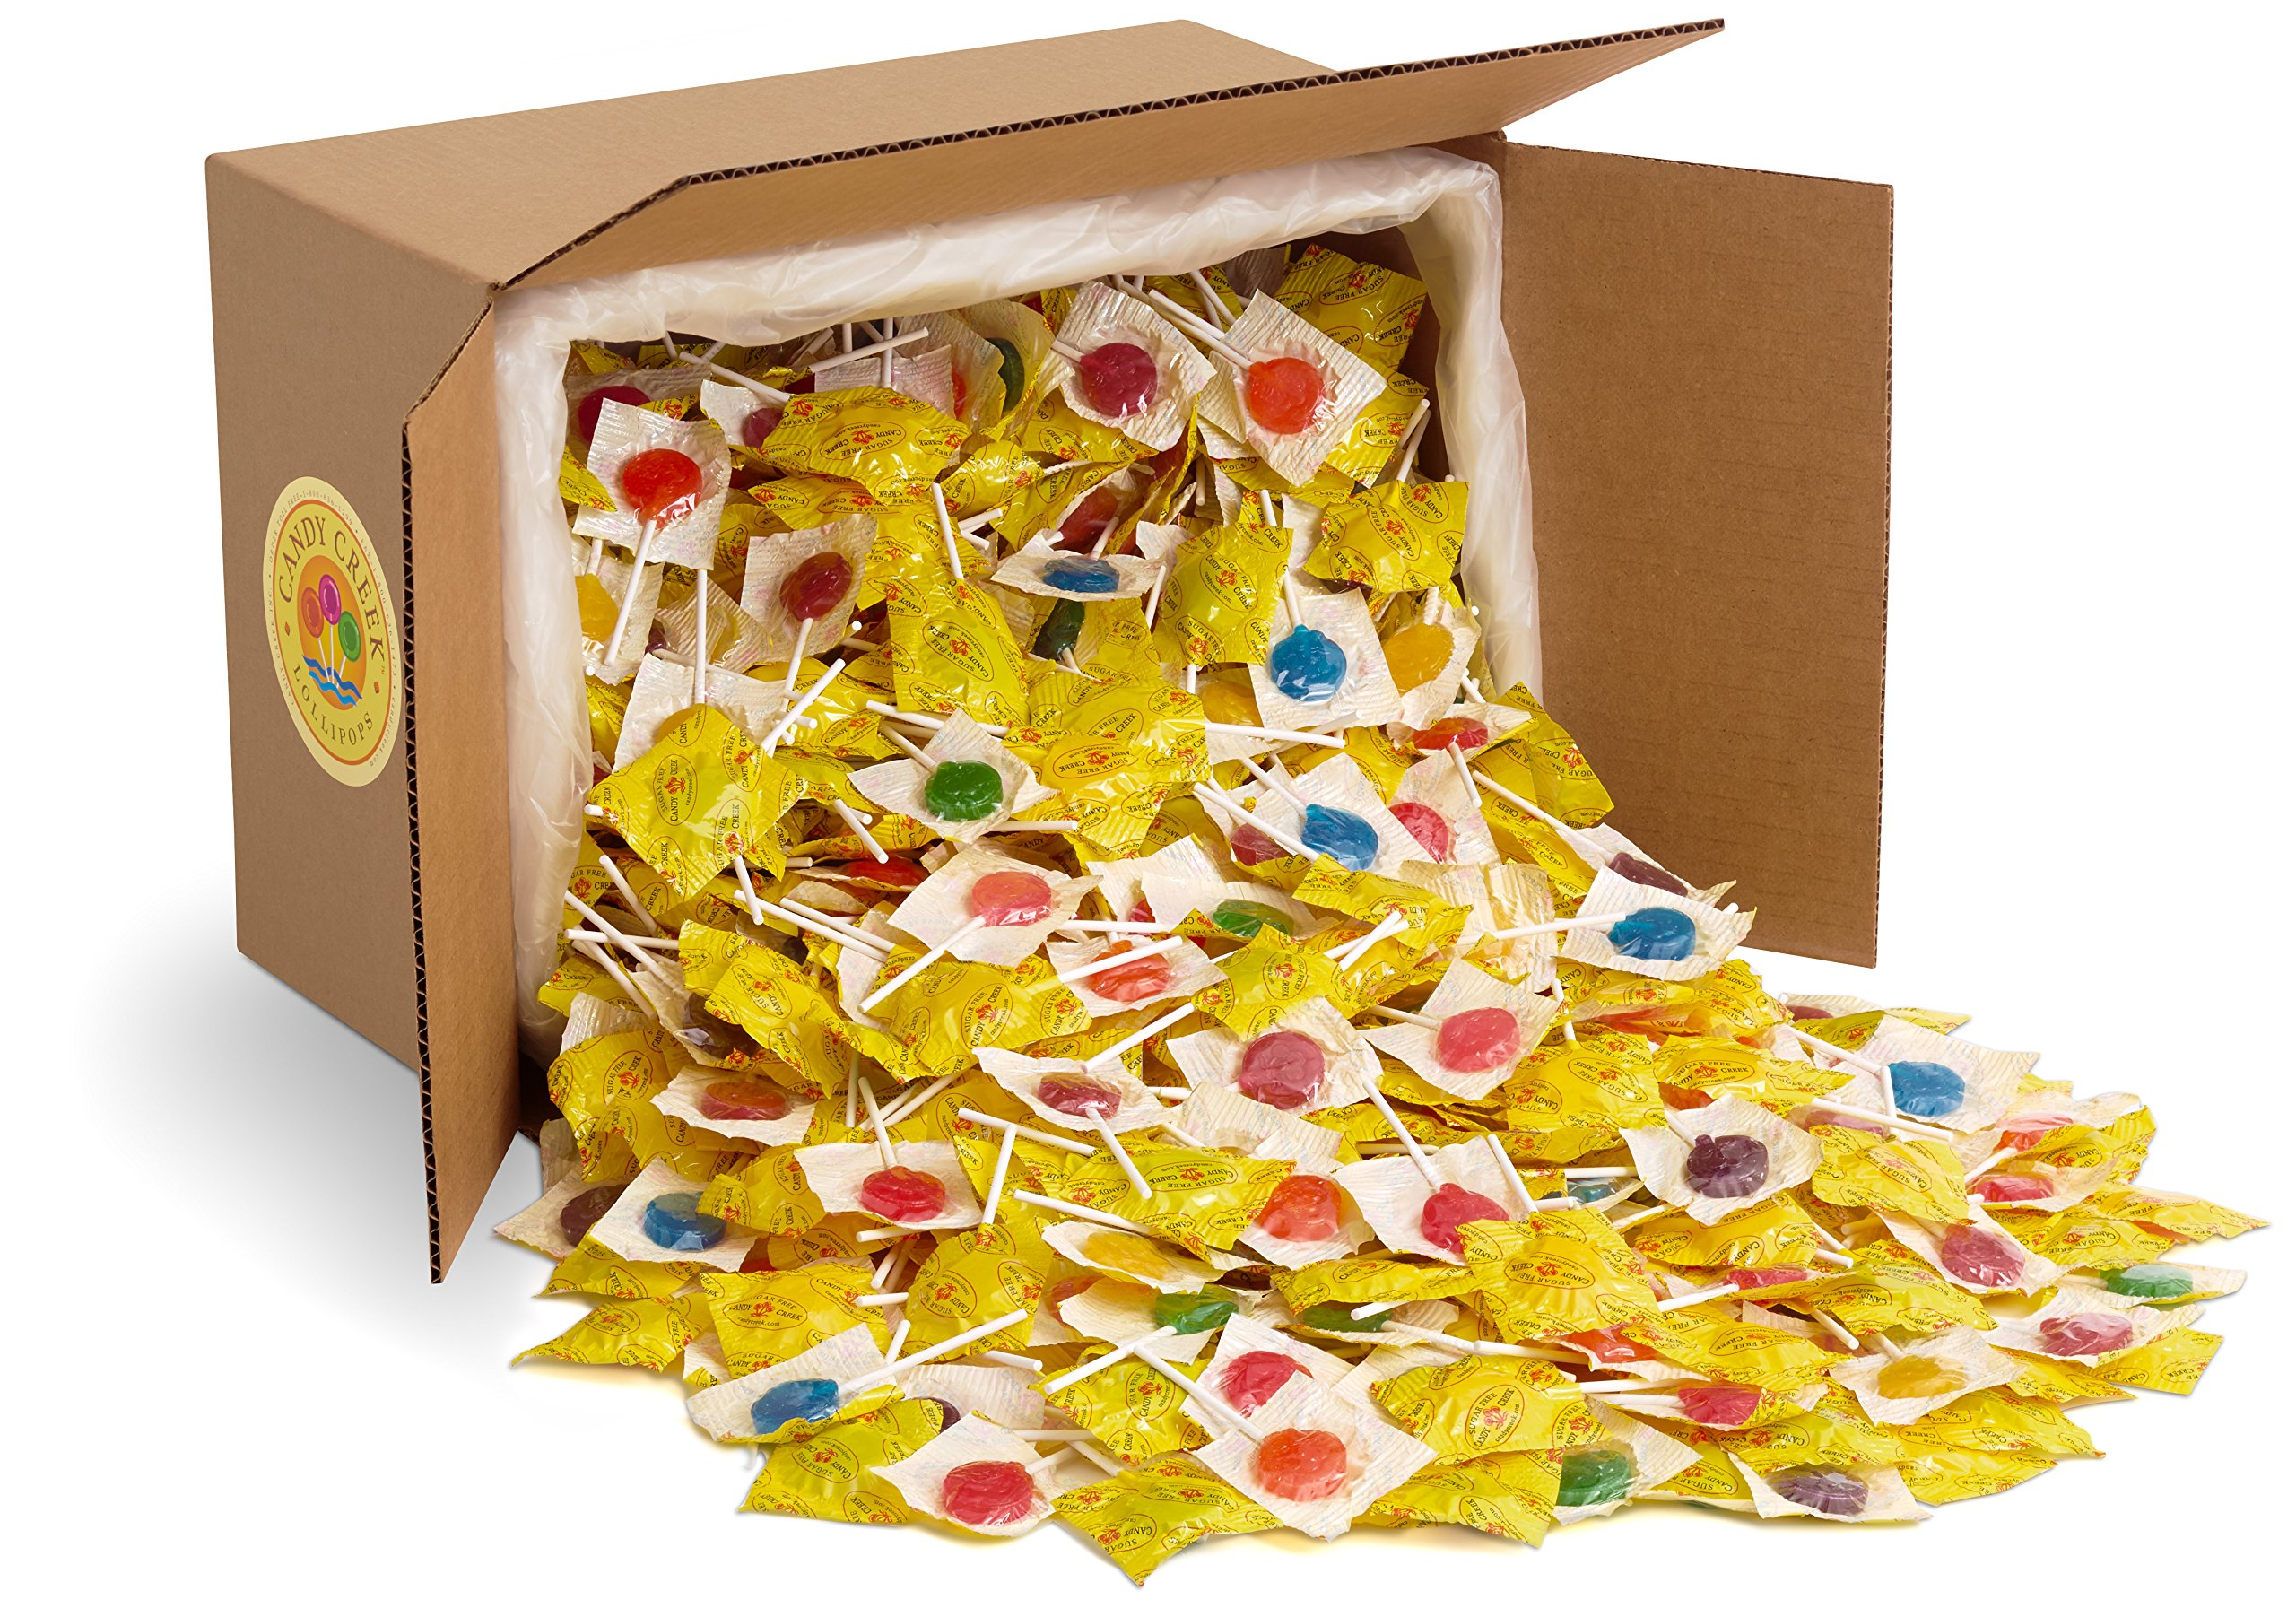 Candy Creek Sugar Free Lollipops, 8 Fruit Flavors, Bulk 15 lb. Carton by Candy Creek Lollipops